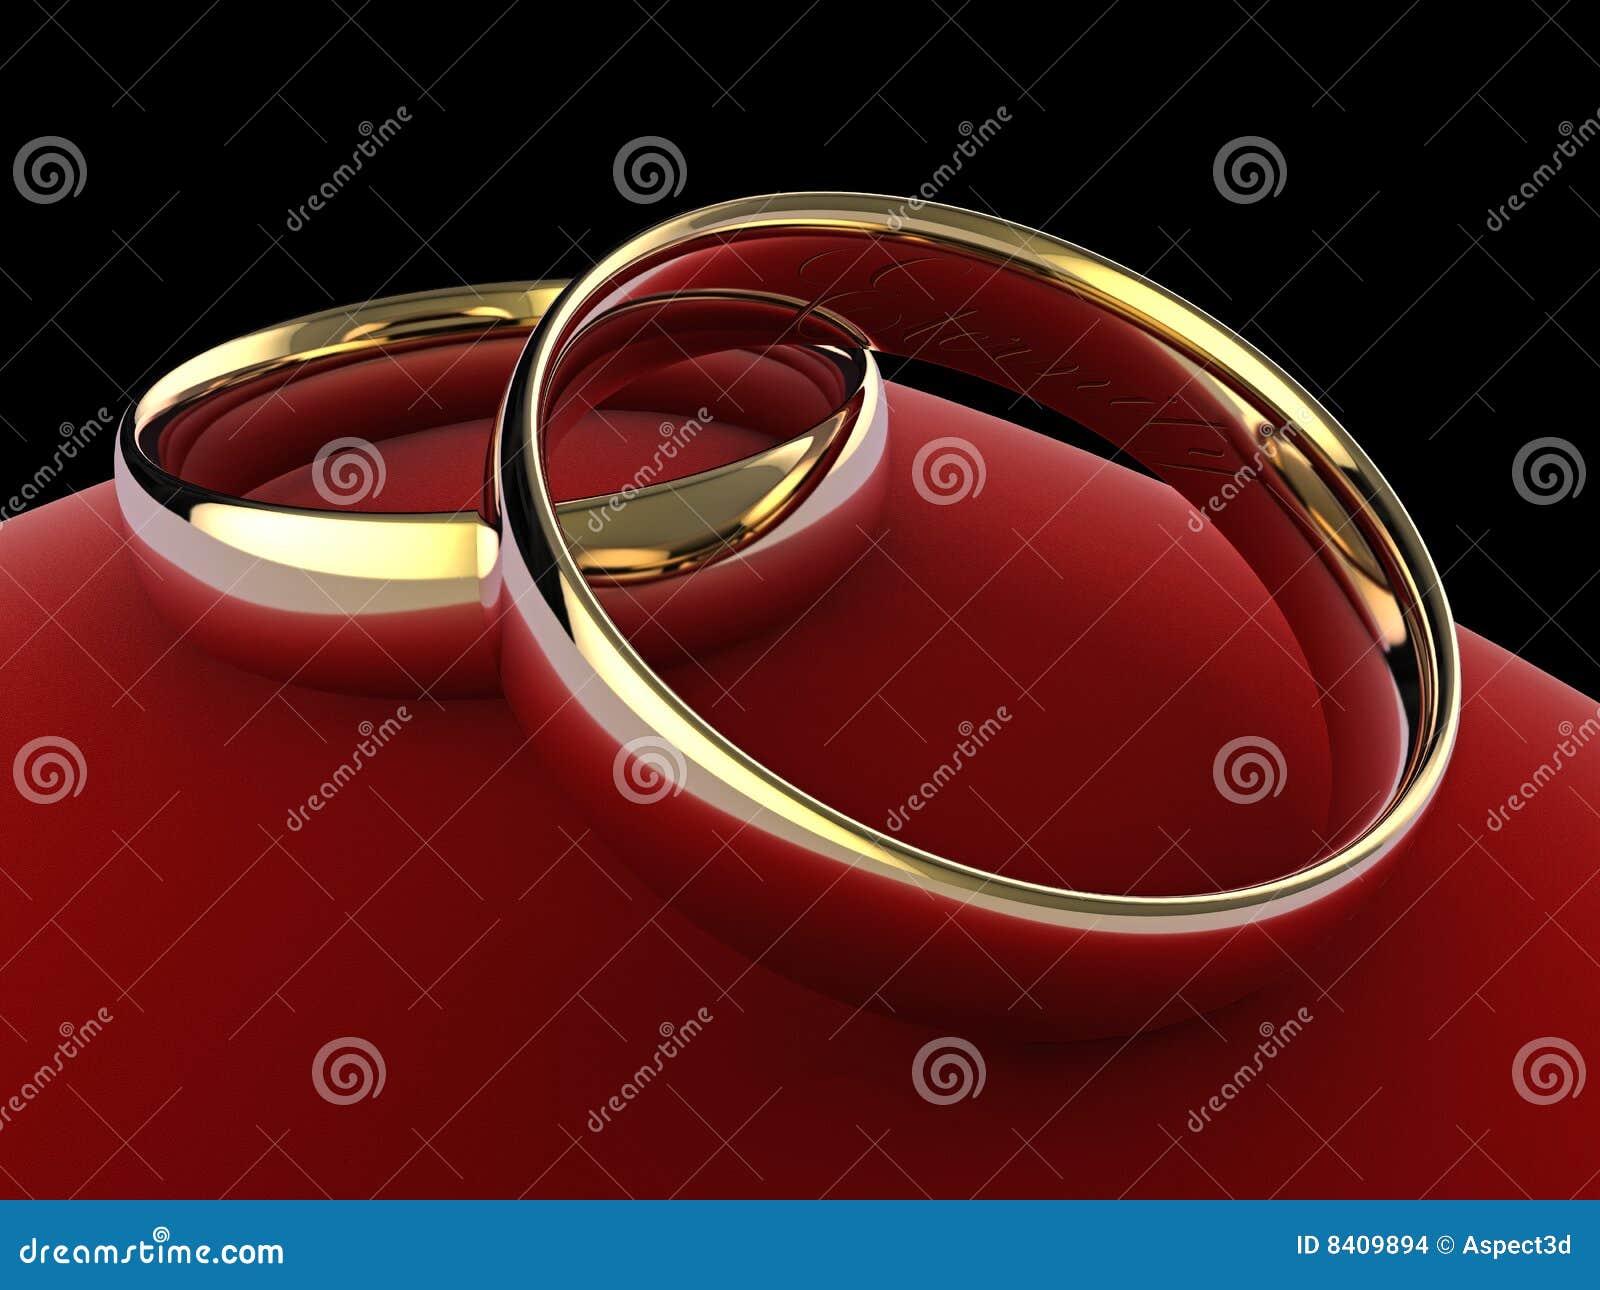 Wedding rings on cushion (eternity engraved)